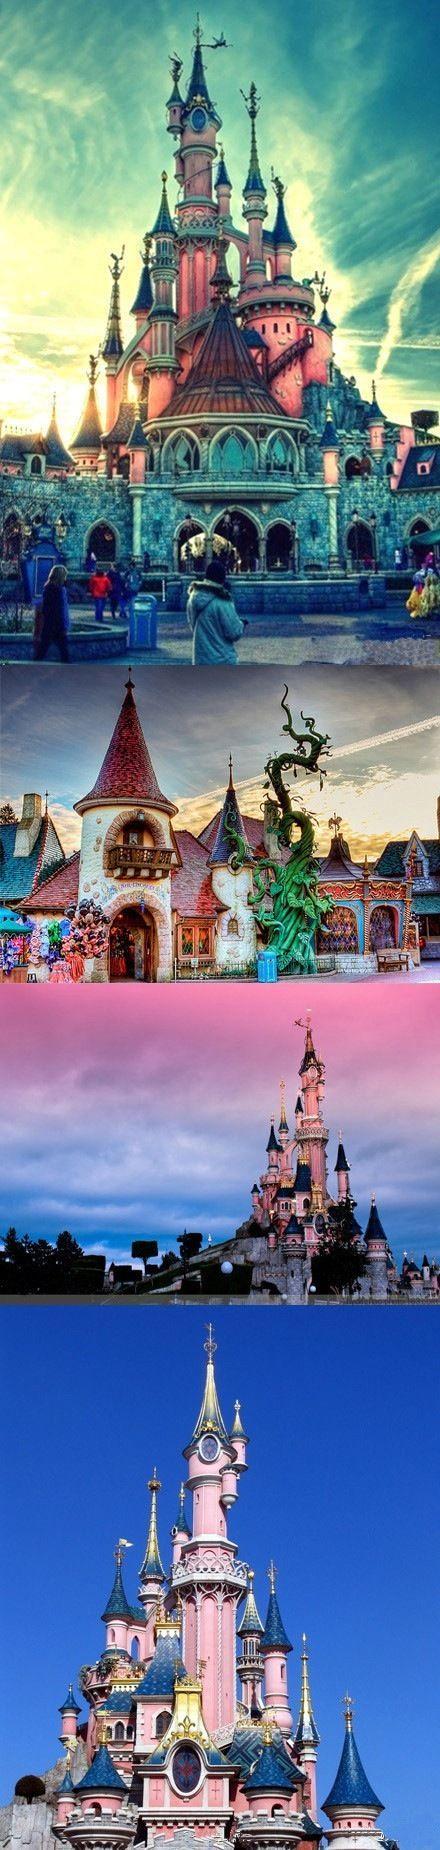 Disneyland paris. Need to go back!